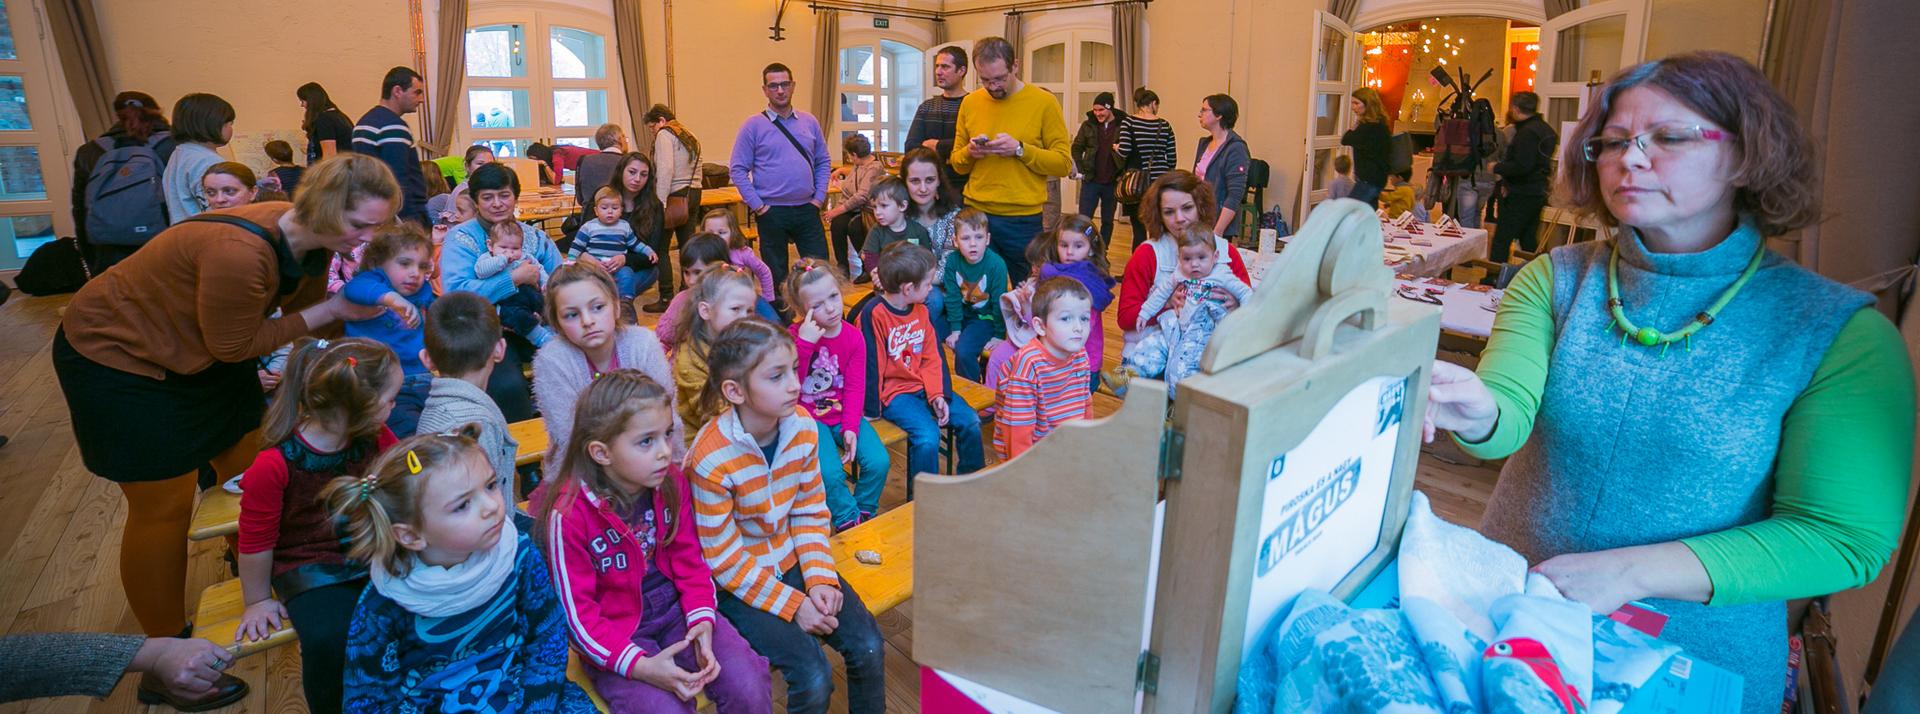 Peste 500 de vizitatori la Pregătiri de Crăciun la Zăbala!